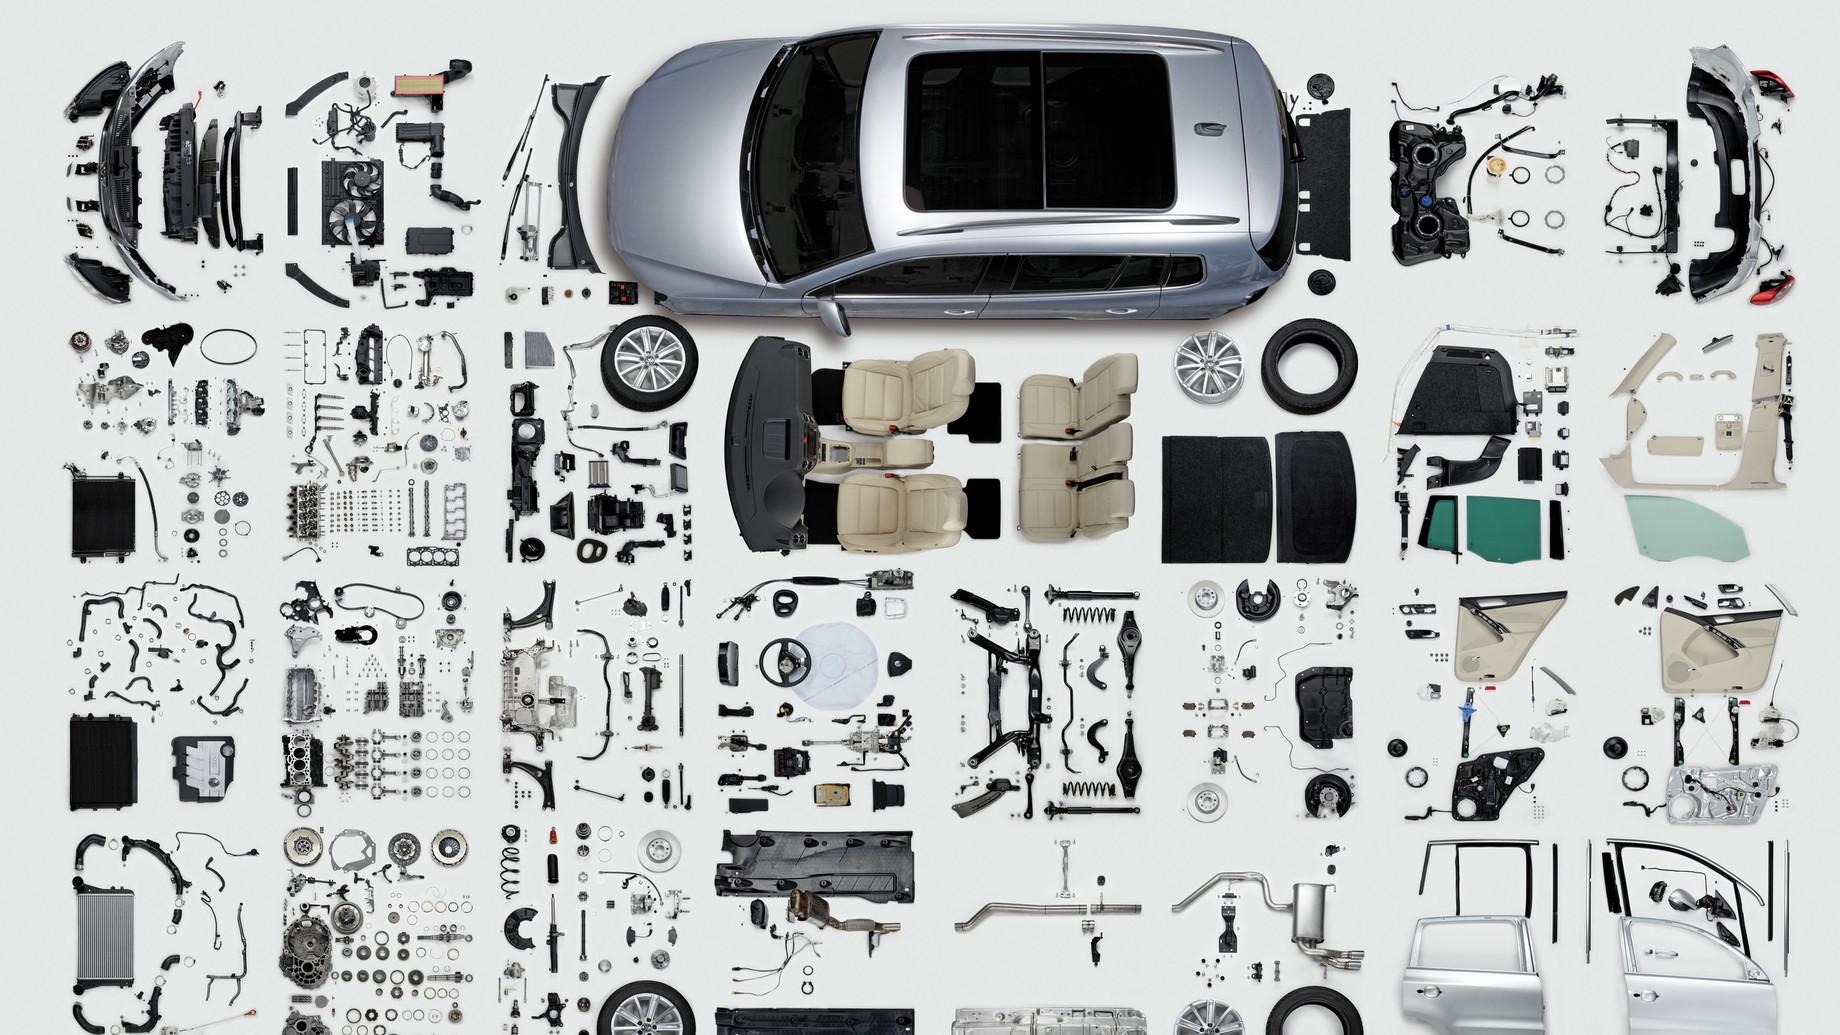 Volkswagen pjese kembimi origjinale